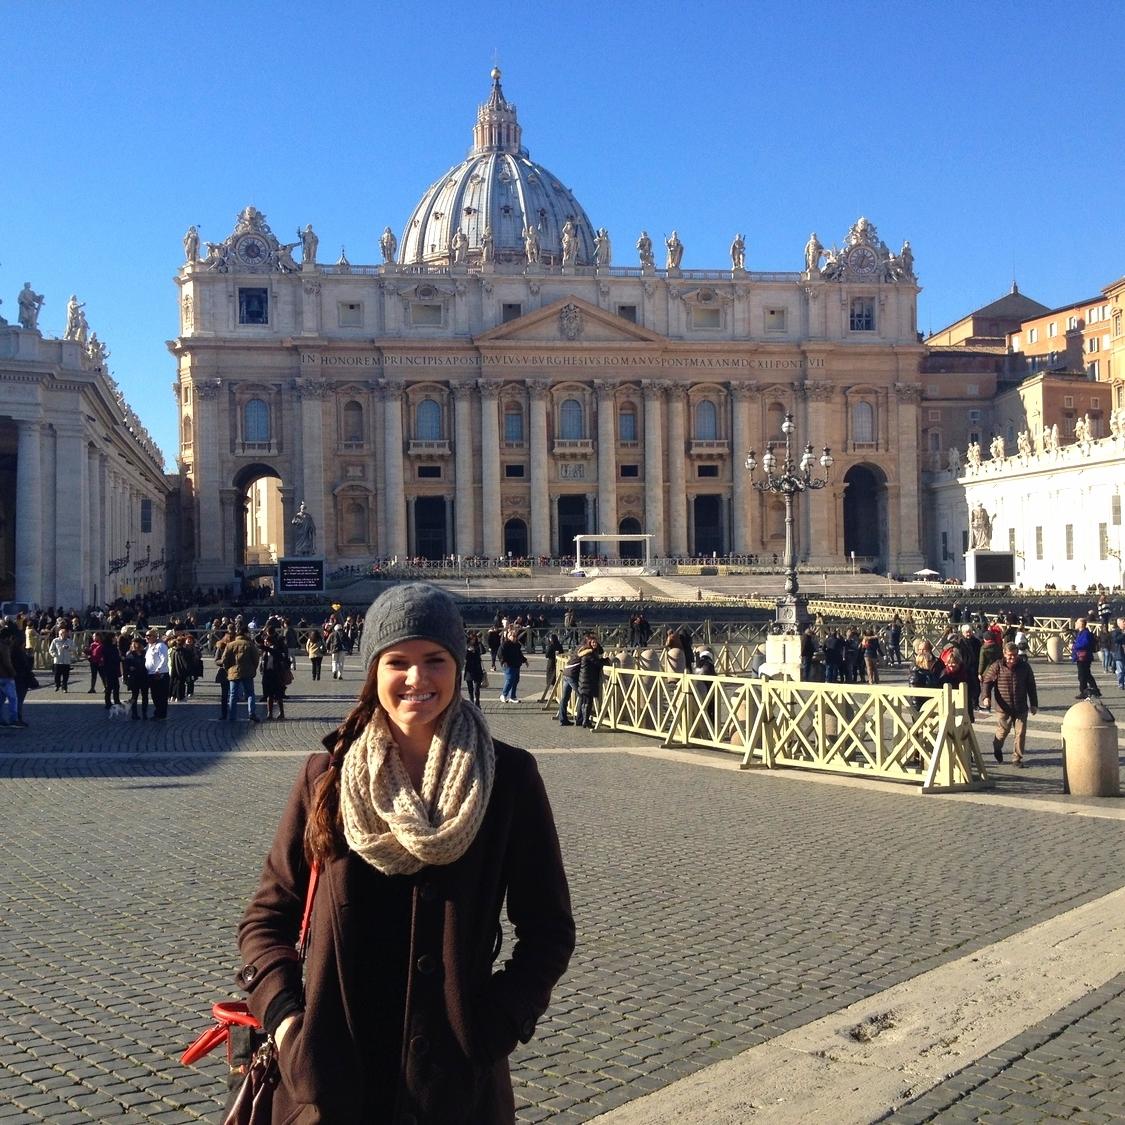 Vatican City/Rome, Italy, 2013